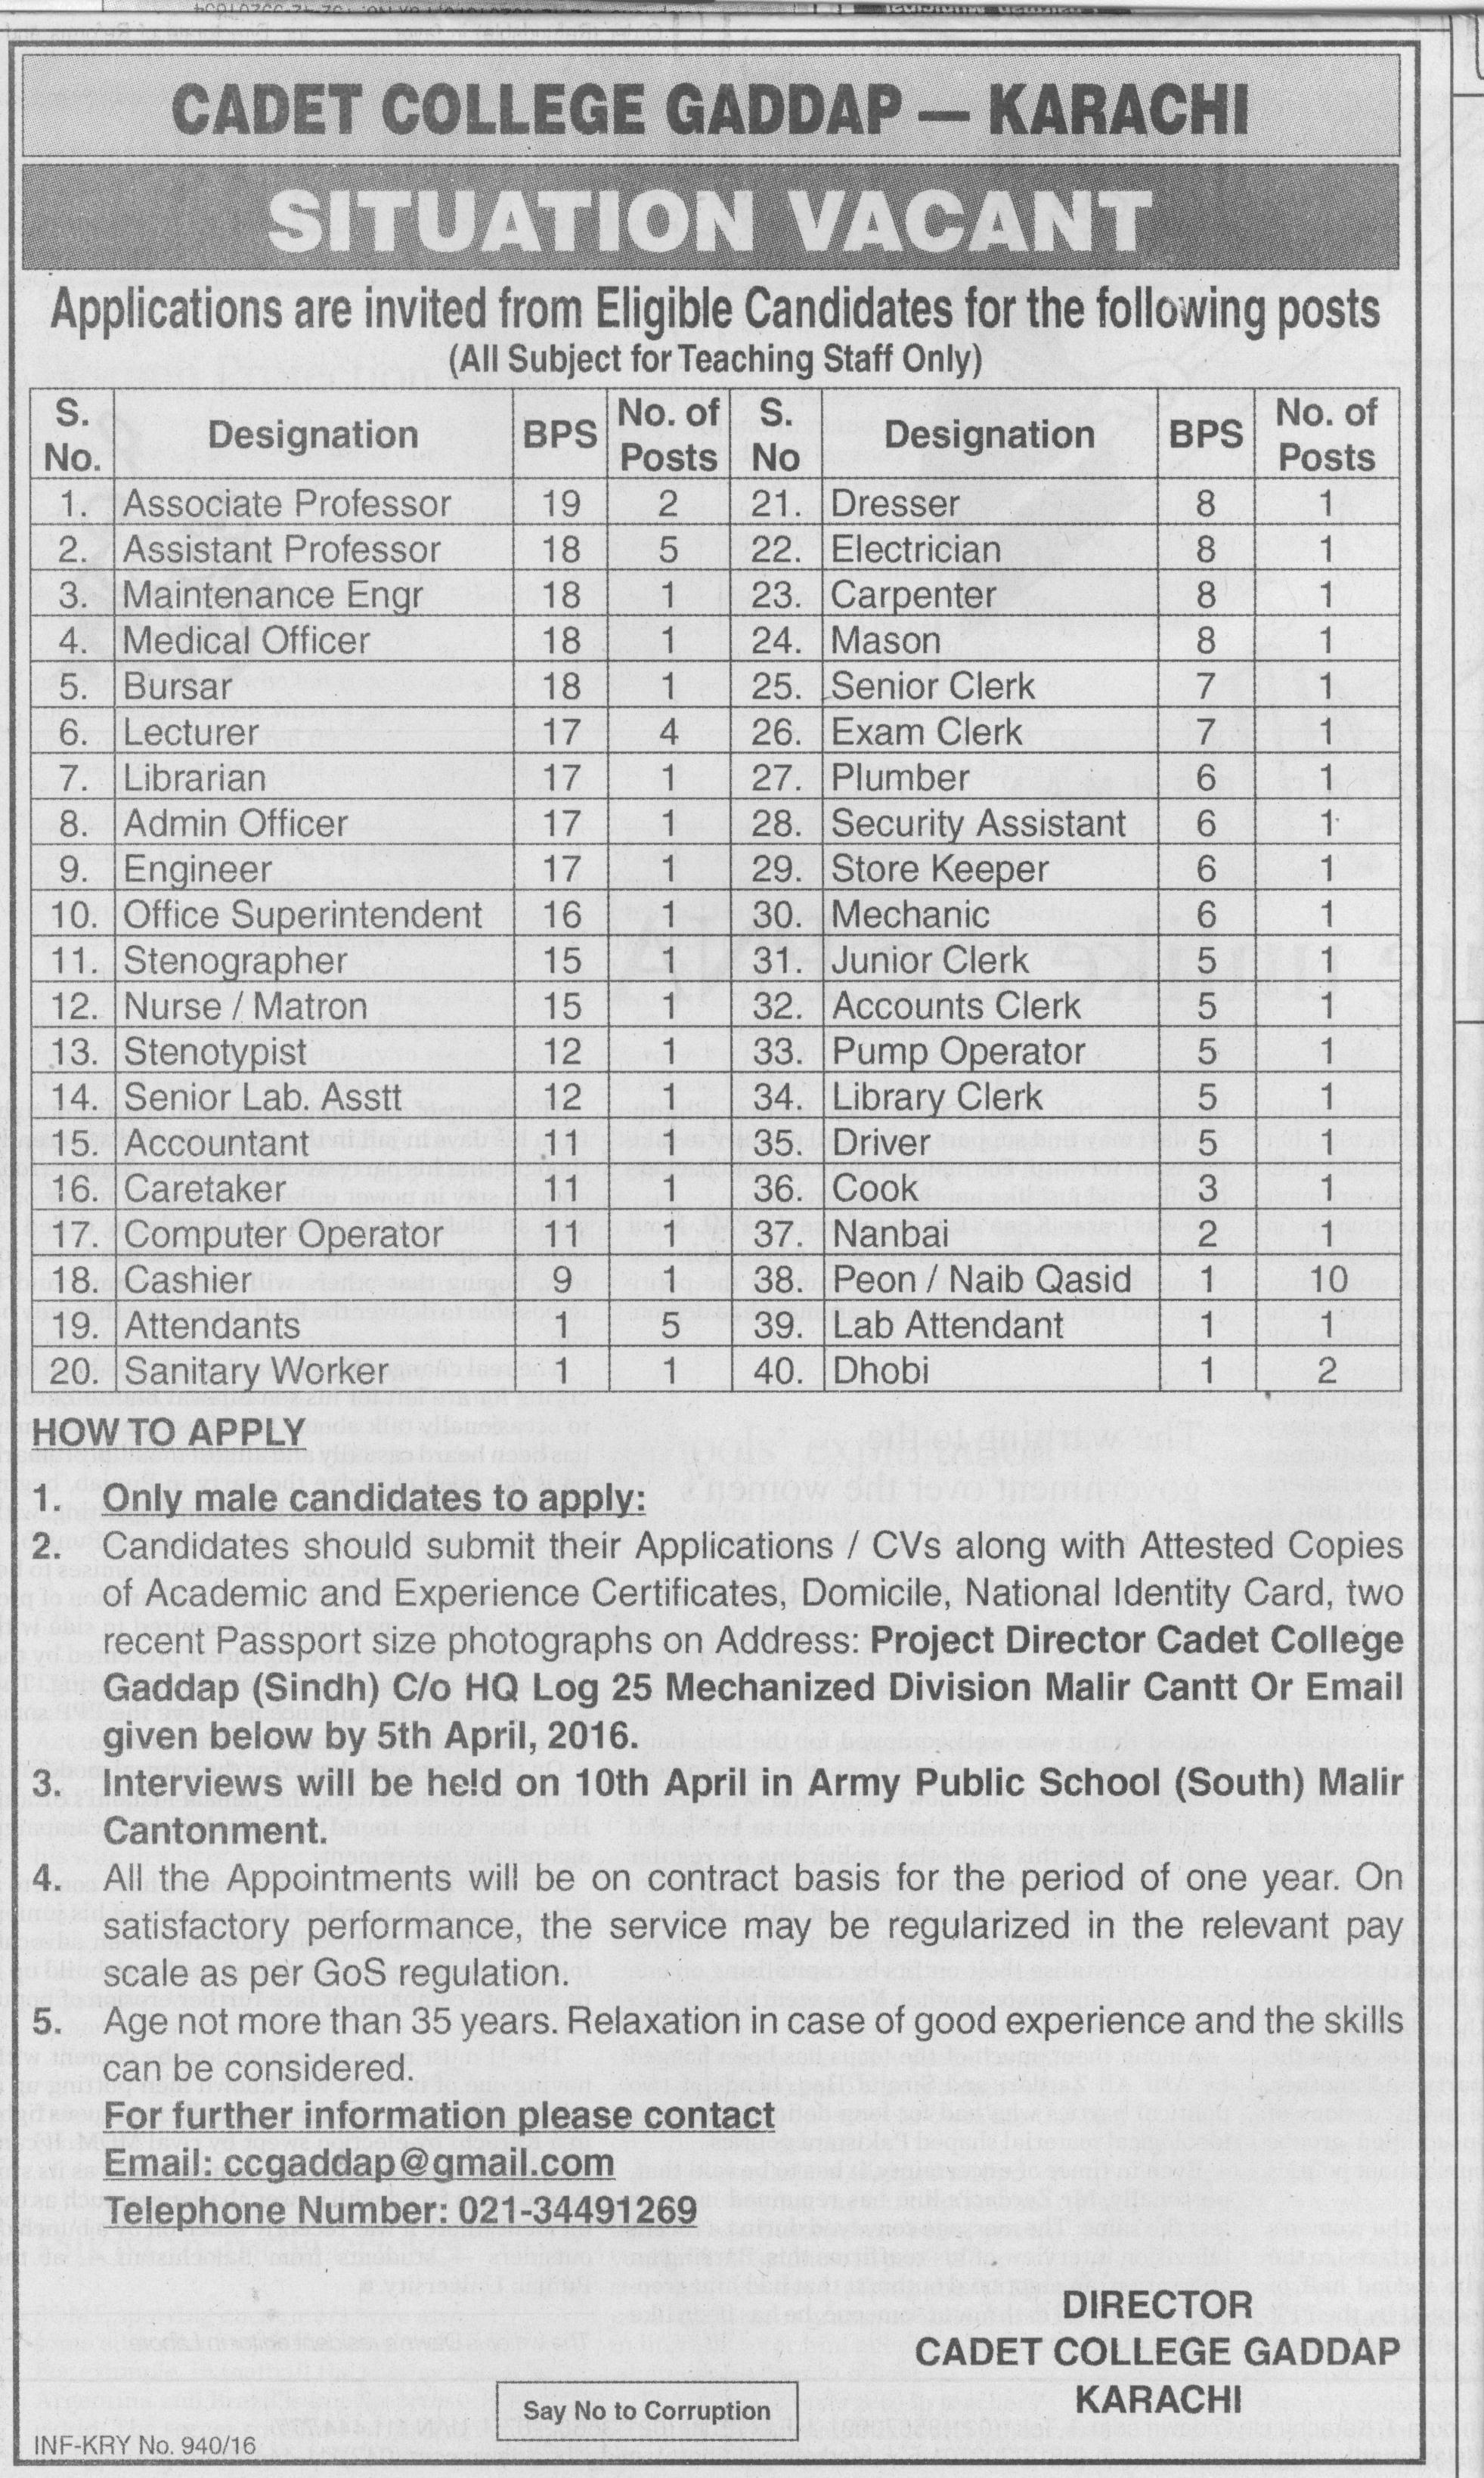 Caddet College Gaddop Karachi Jobs 2016